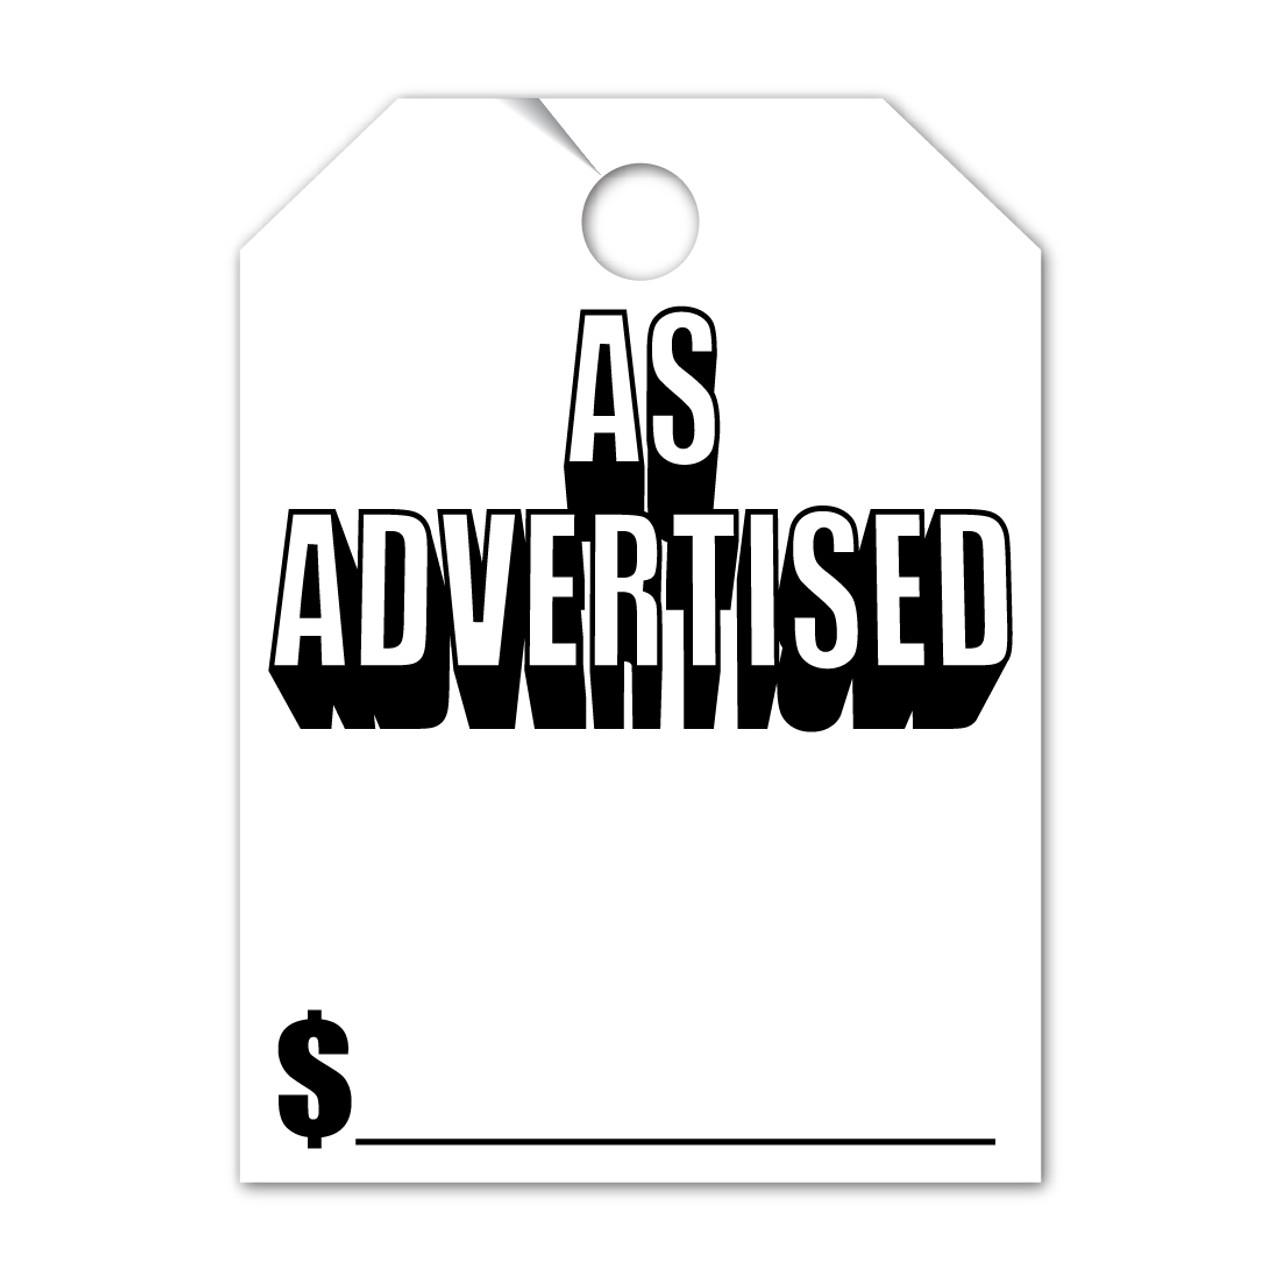 As Advertised Mirror Hang Tag  8.5 X 11.5 (VT-#280- AA)